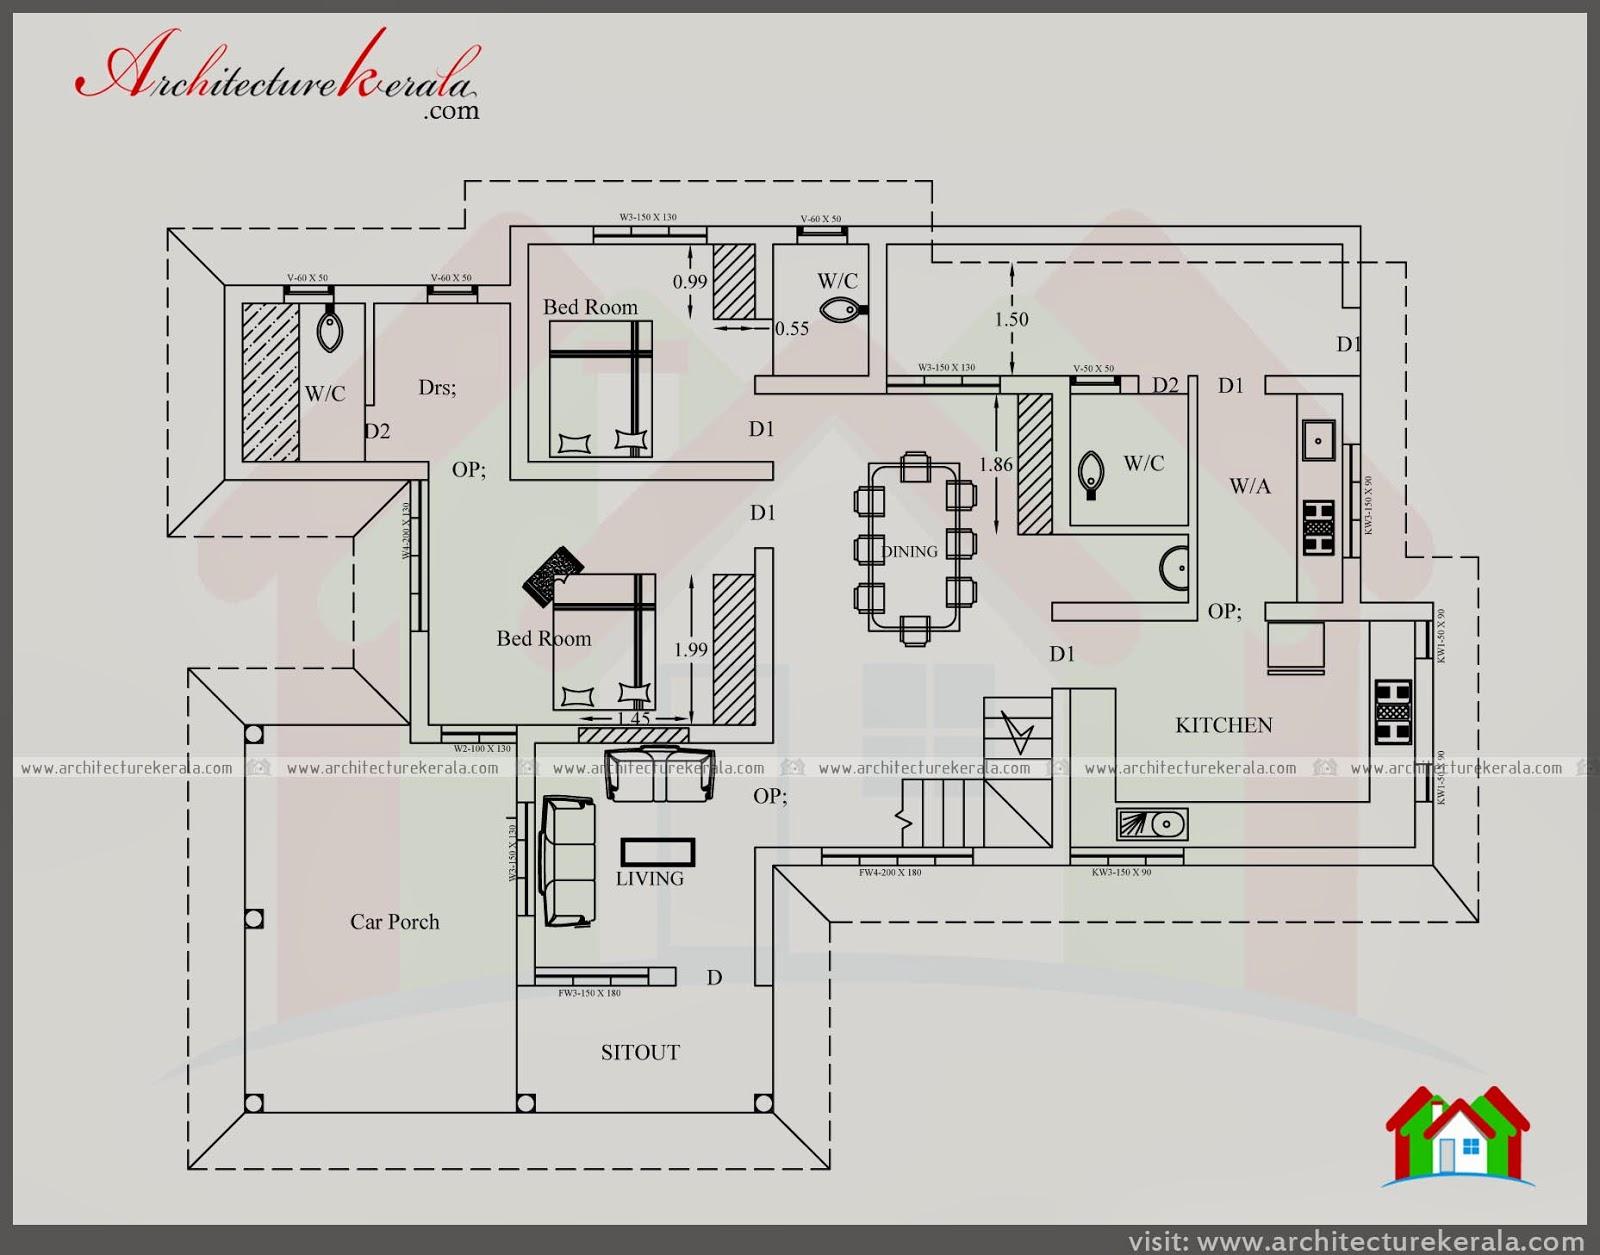 http://www.architecturekerala.com/